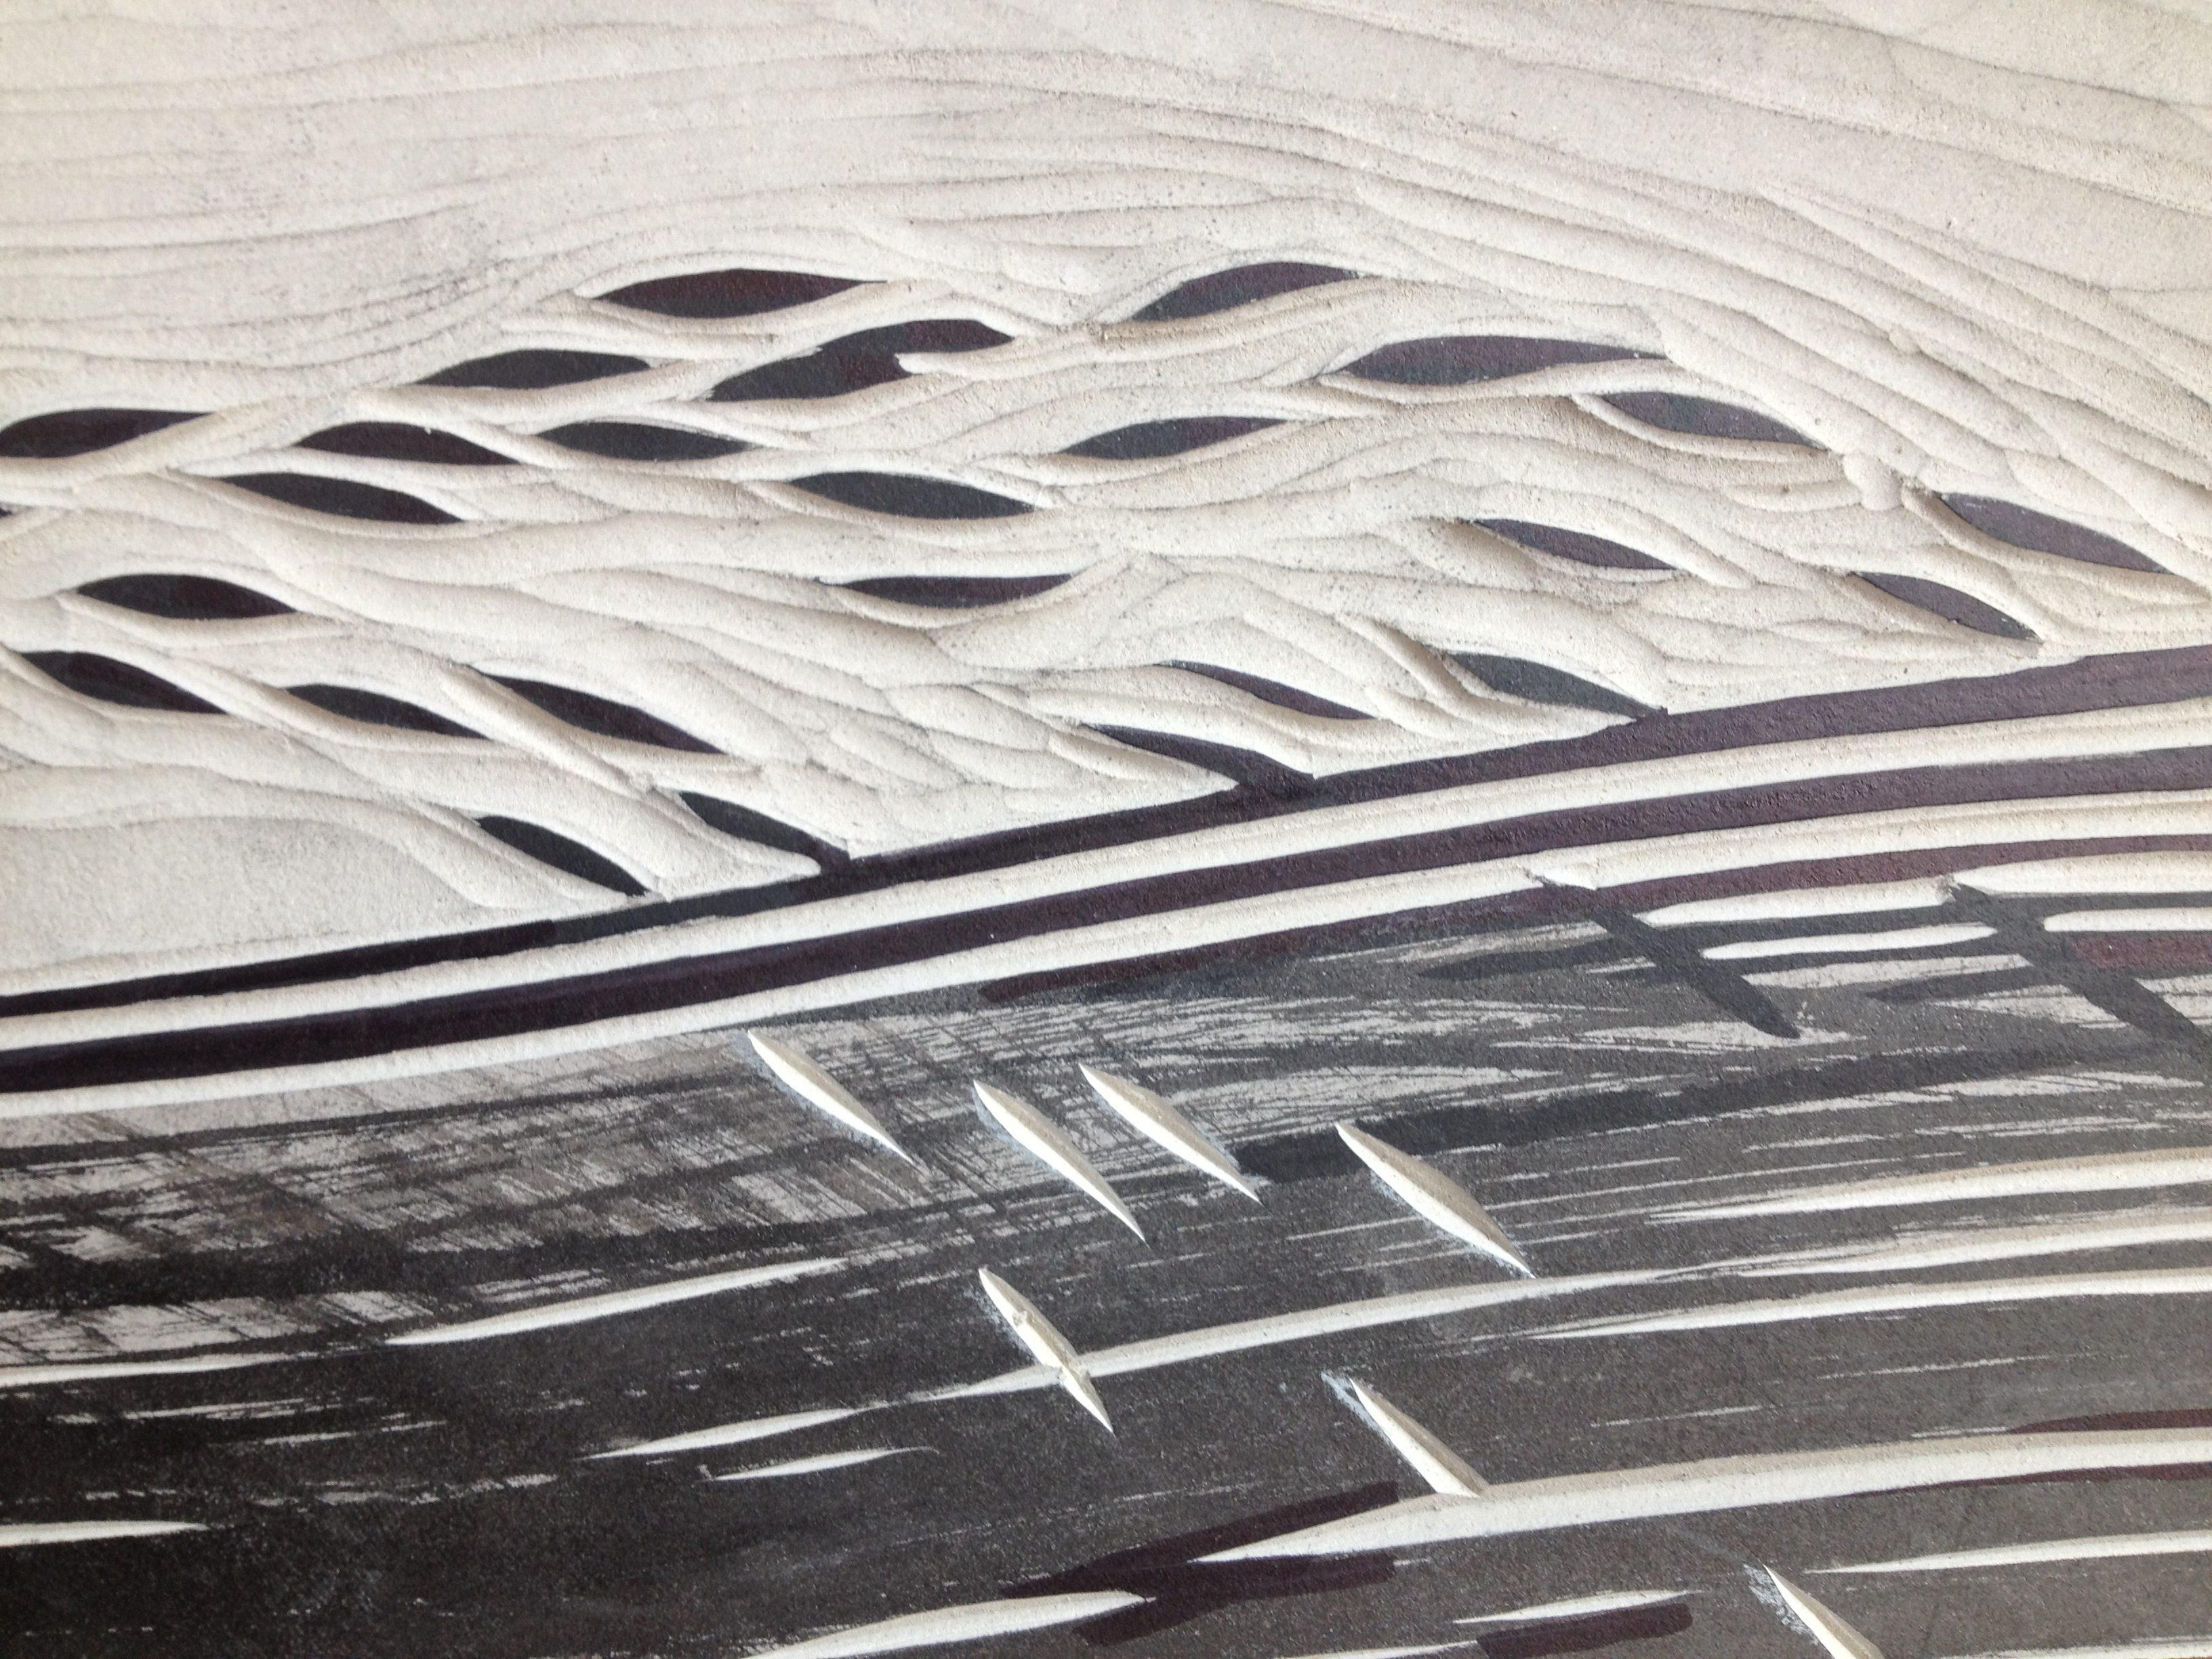 linocut detail